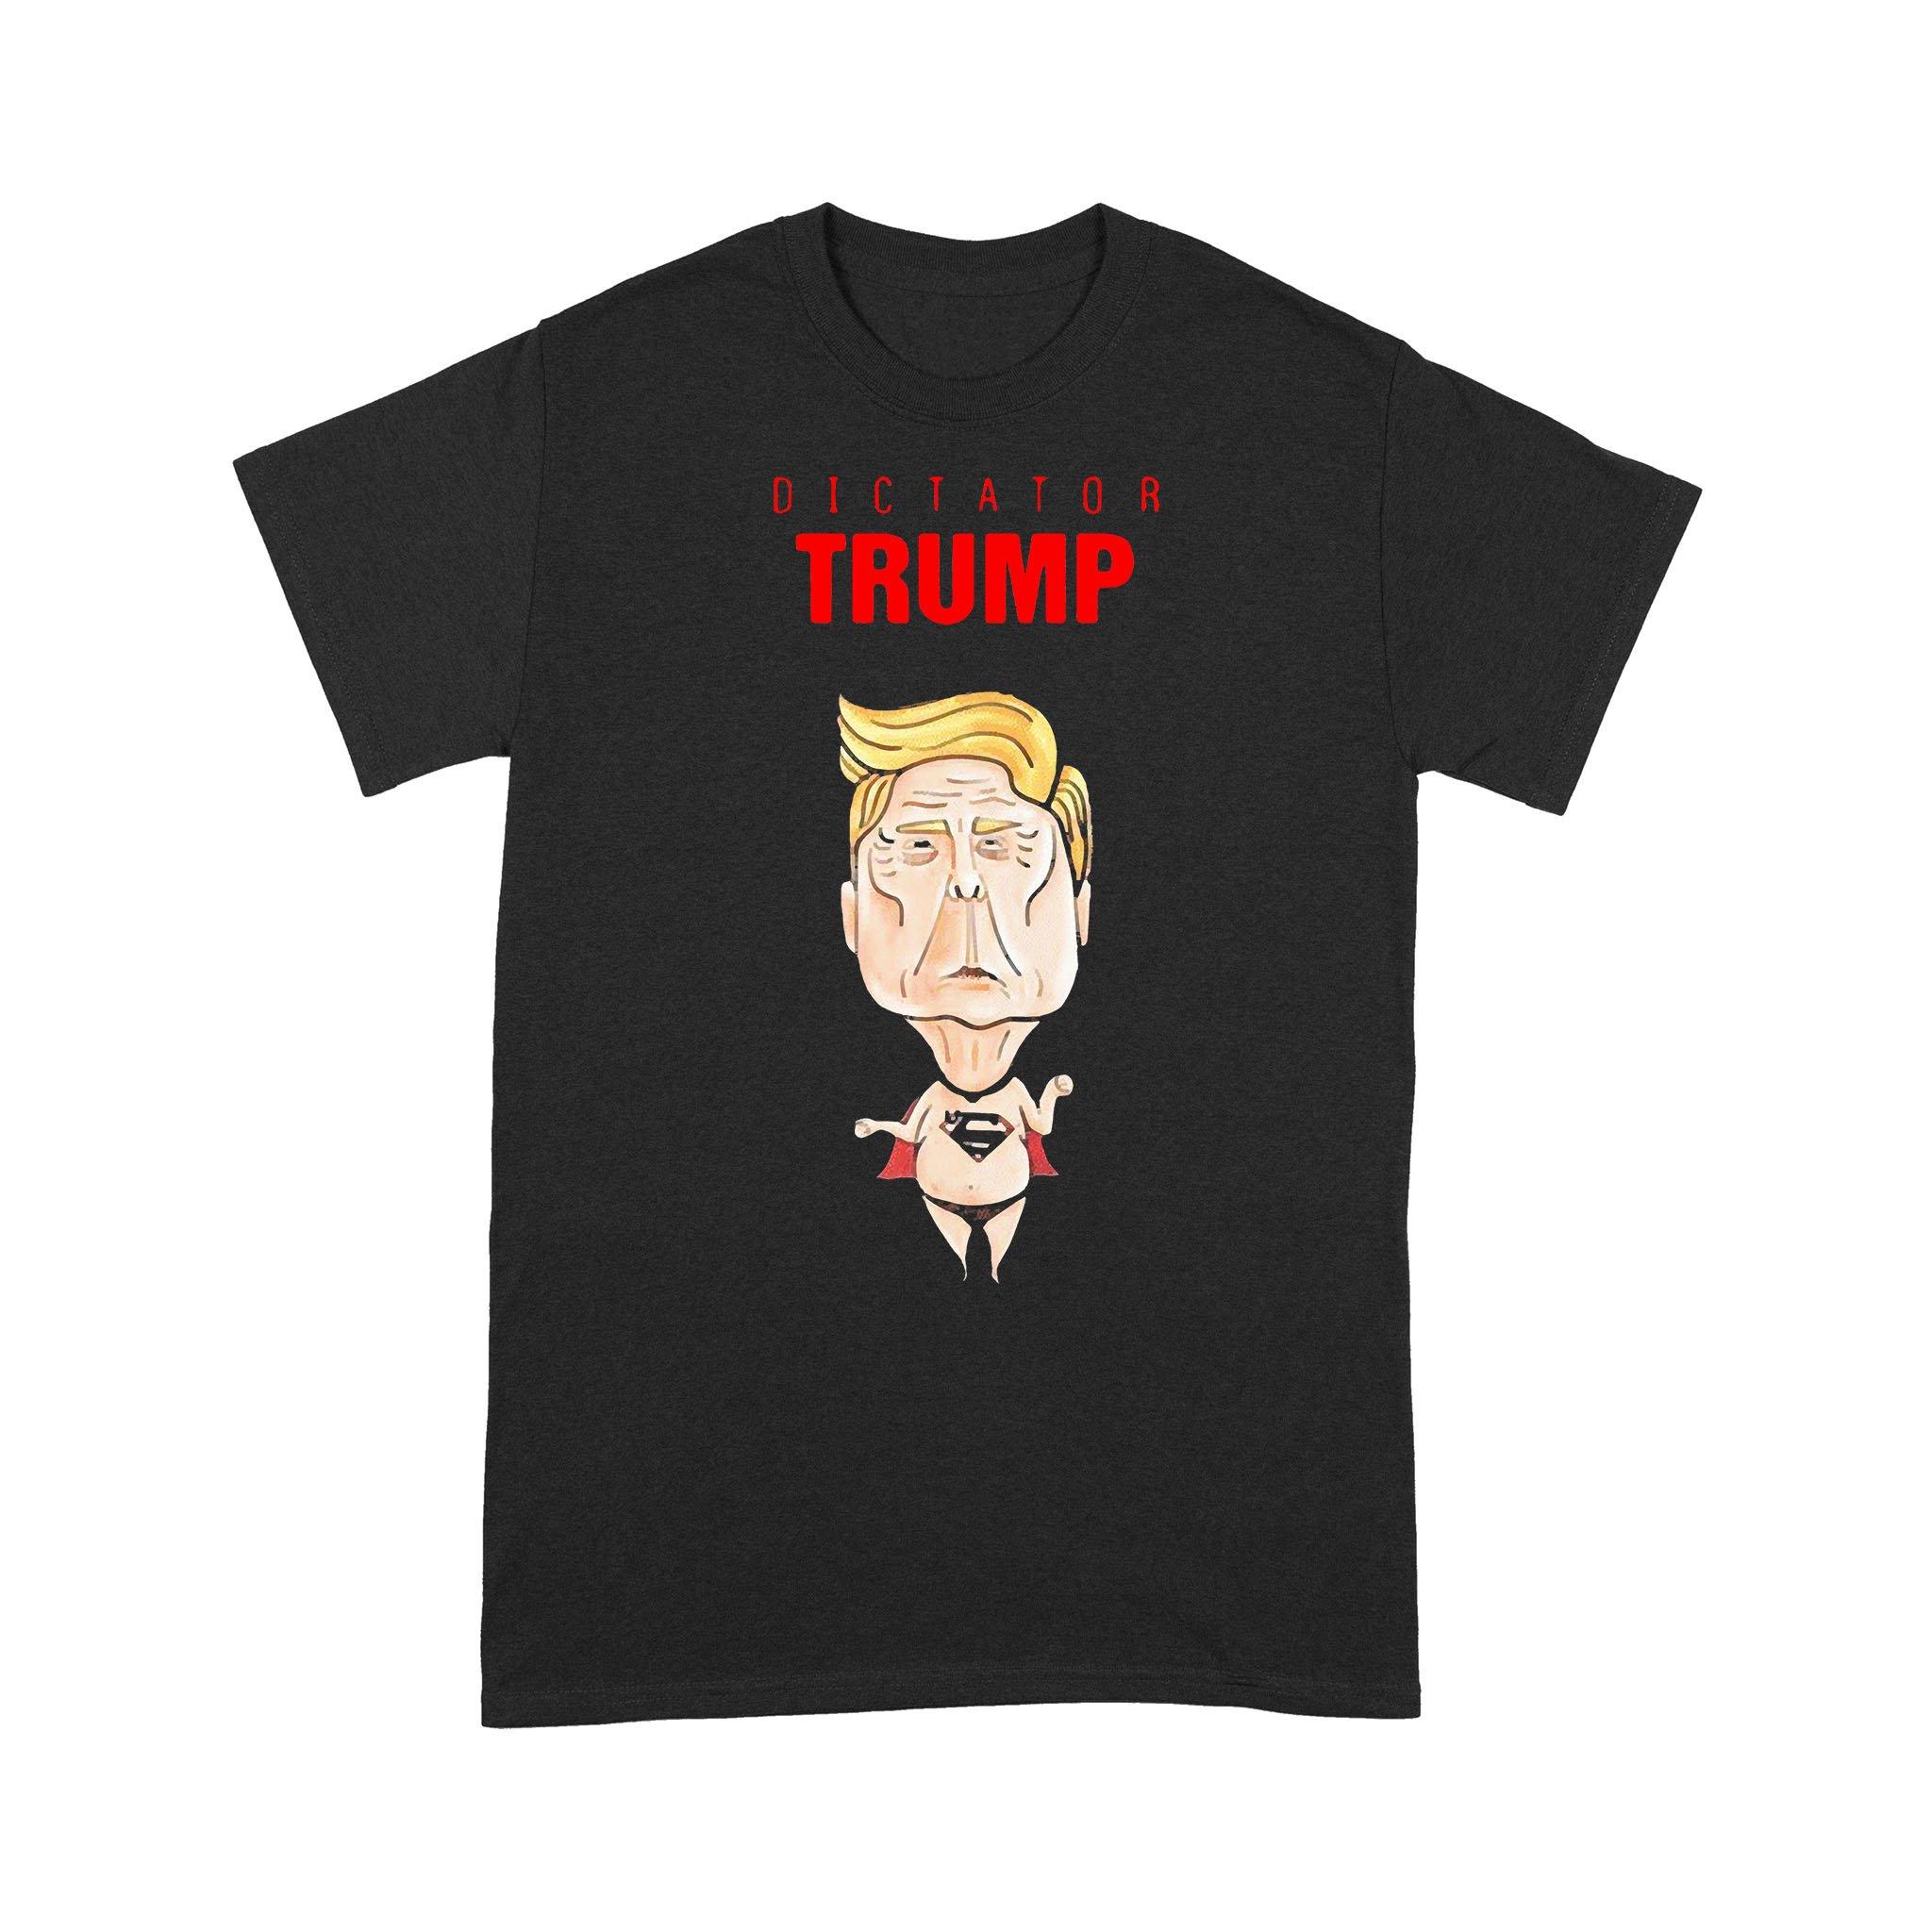 Dictator Trump T-shirt